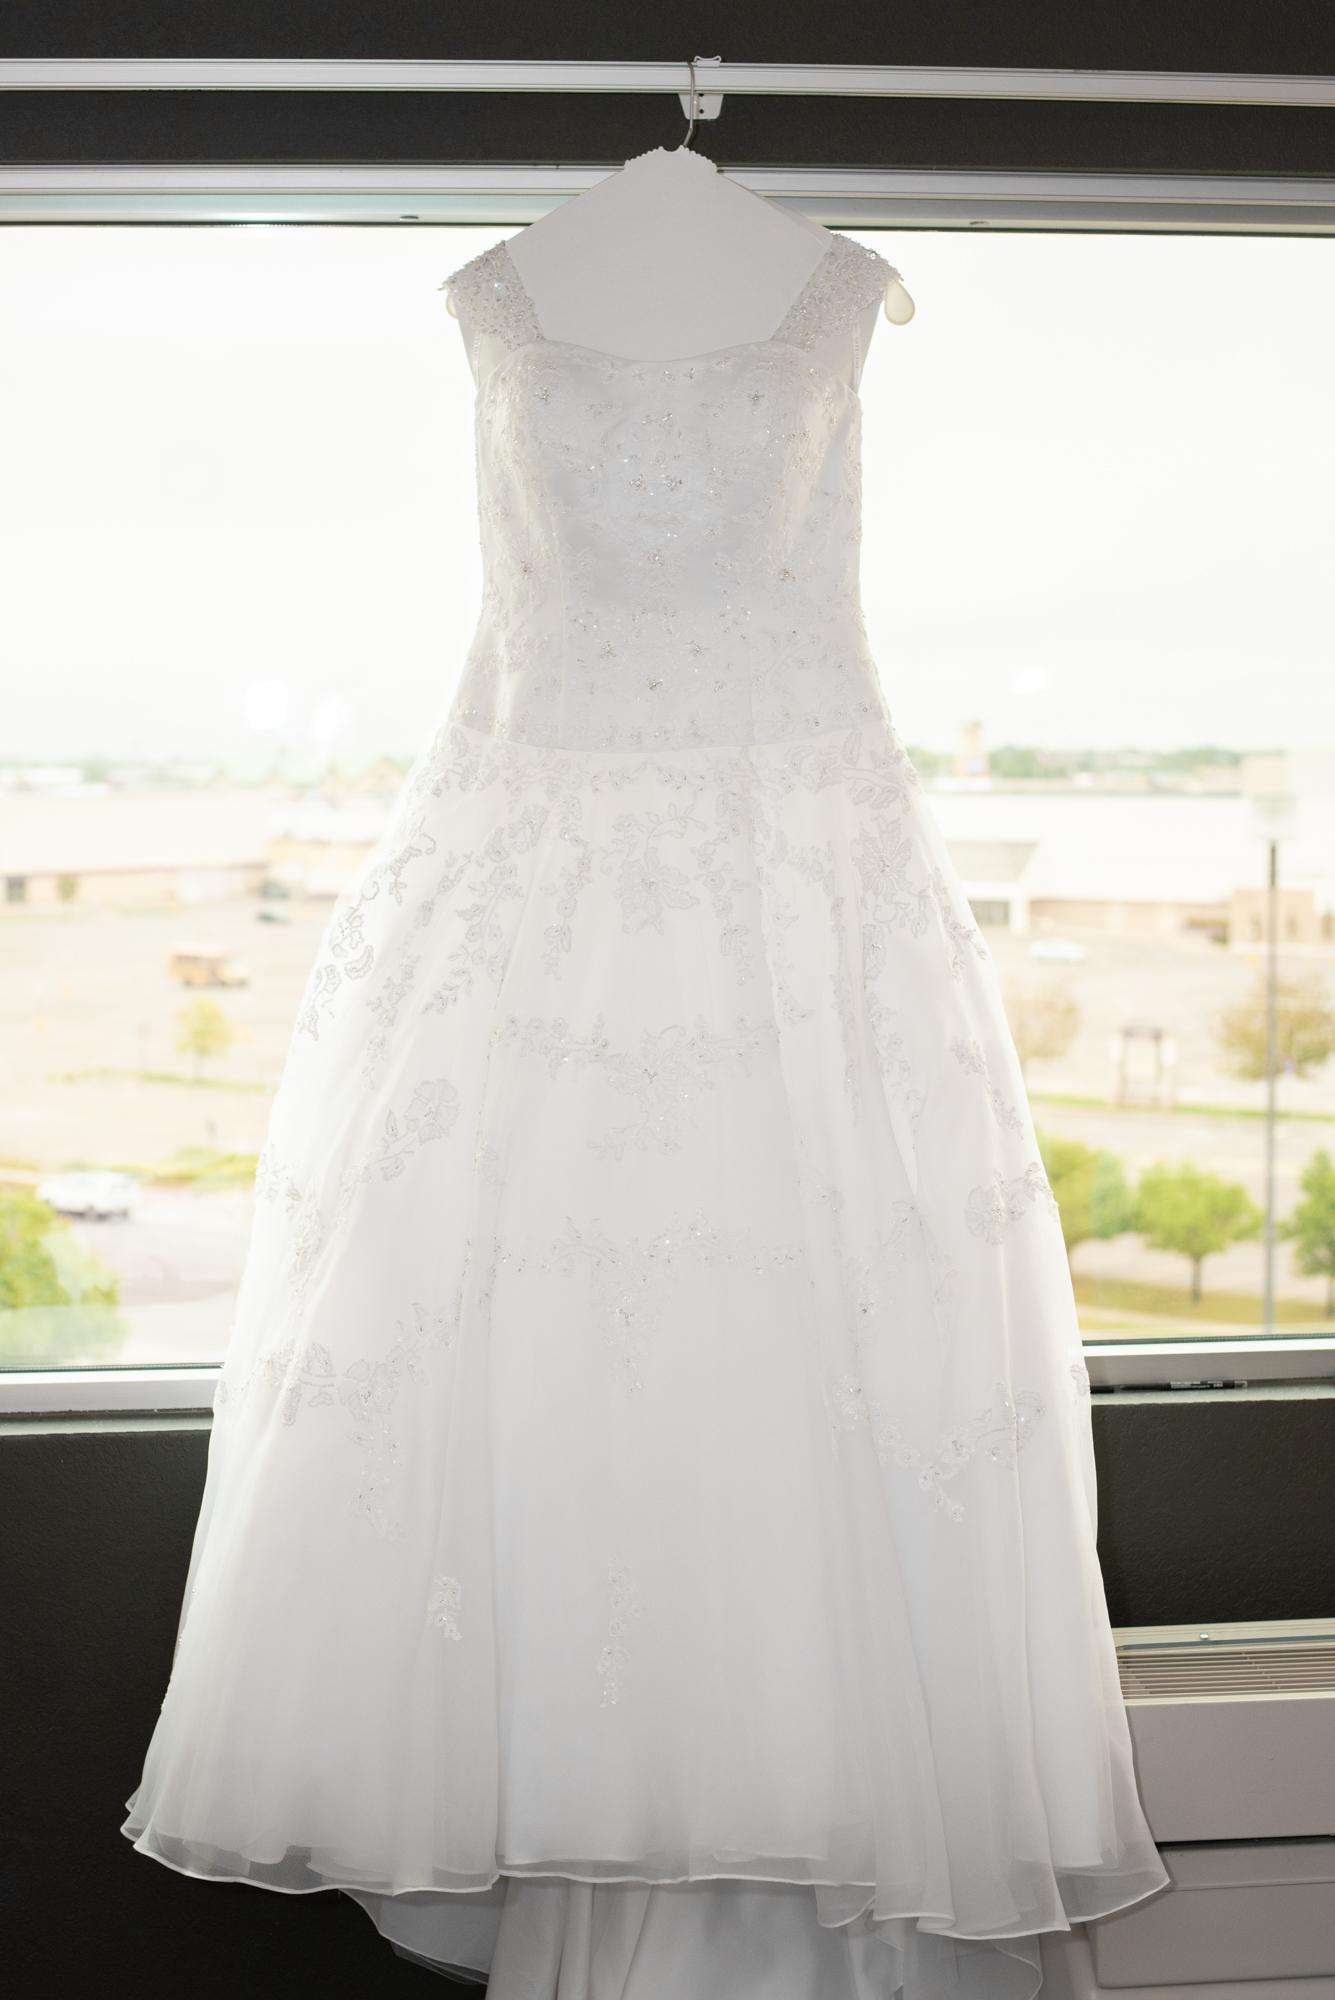 DSC 7119 - Emma and Chris | Fargo Wedding